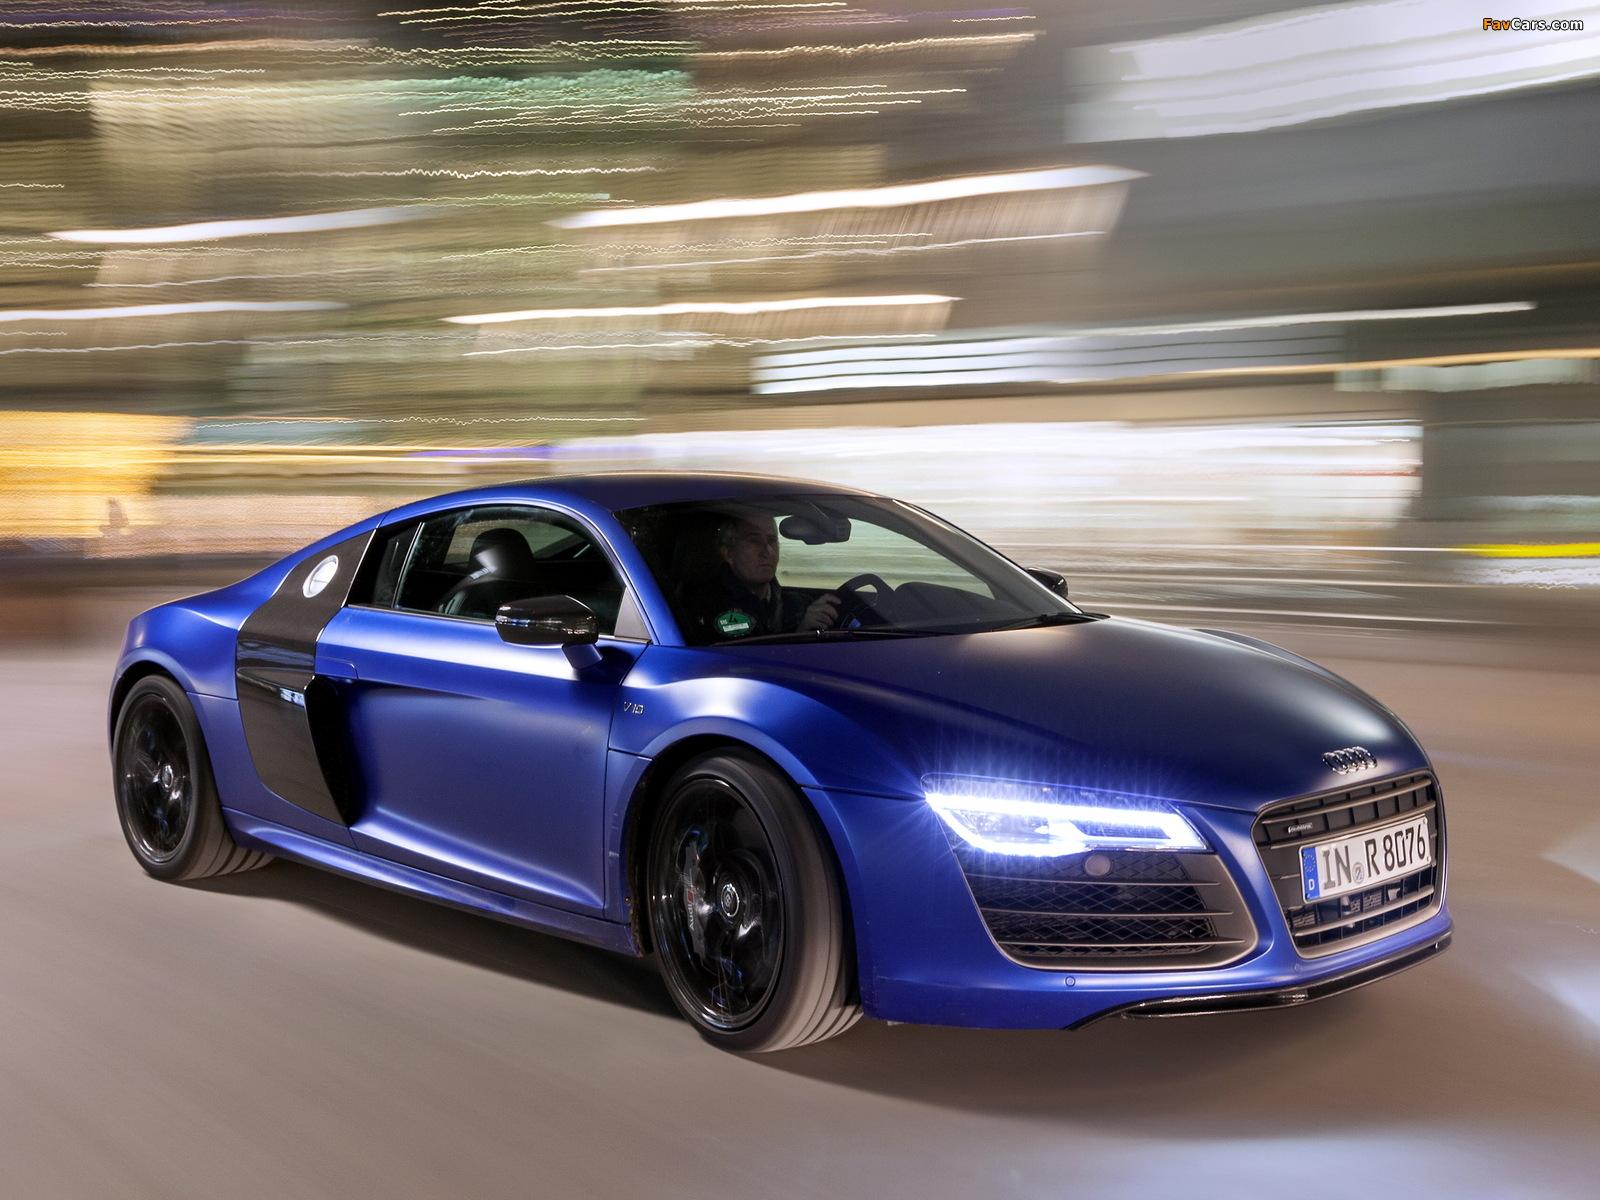 Photos Of Audi R8 V10 Plus 2012 1600x1200